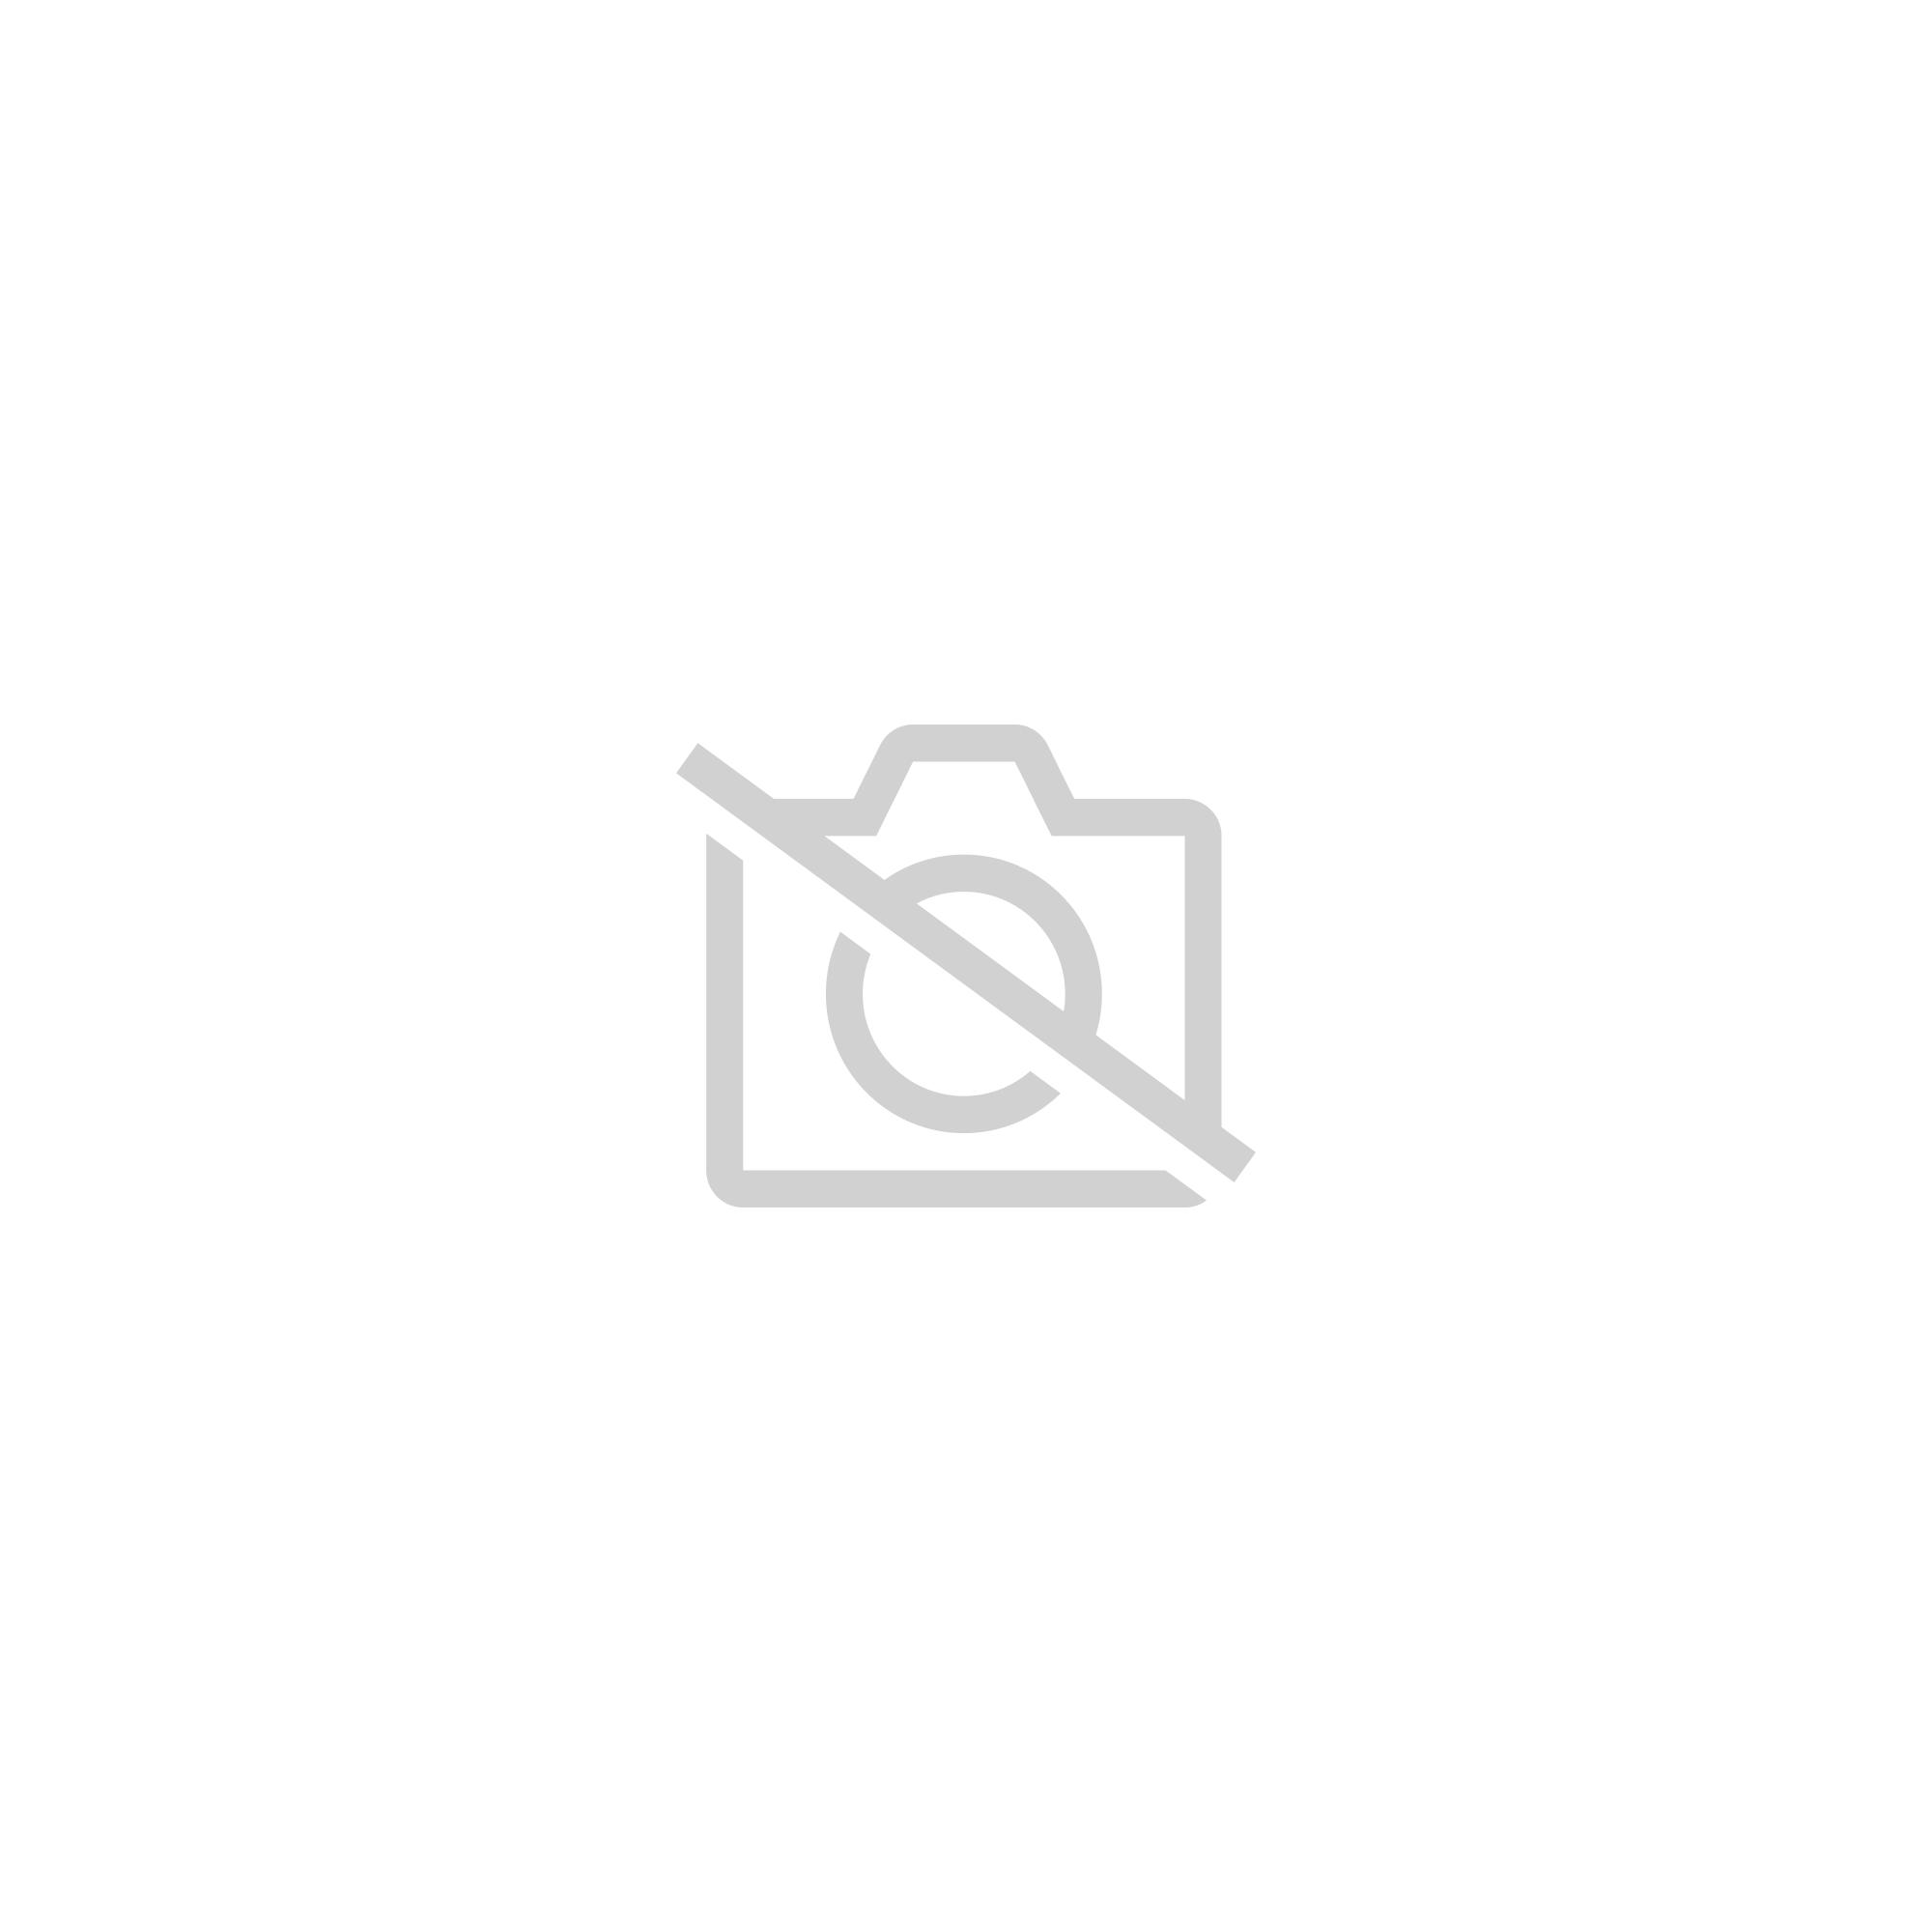 Bottes Talons Cheyenne - Marron - Taille 38